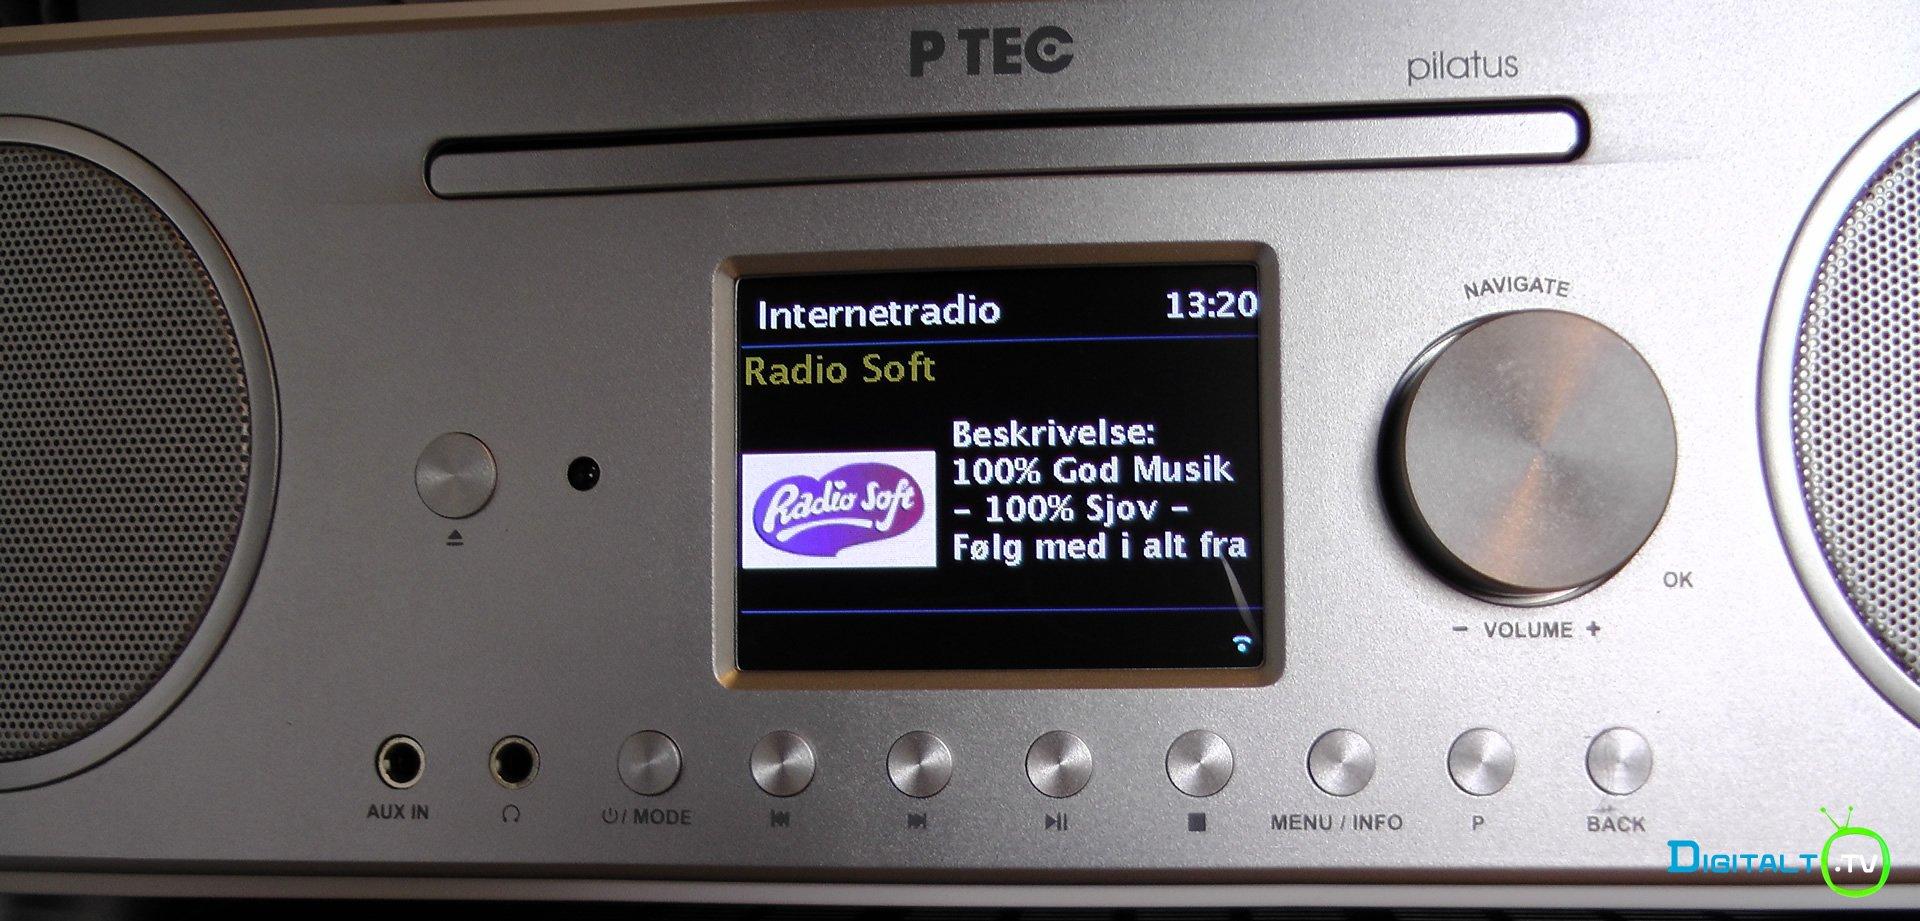 Pilatus Internetradio display